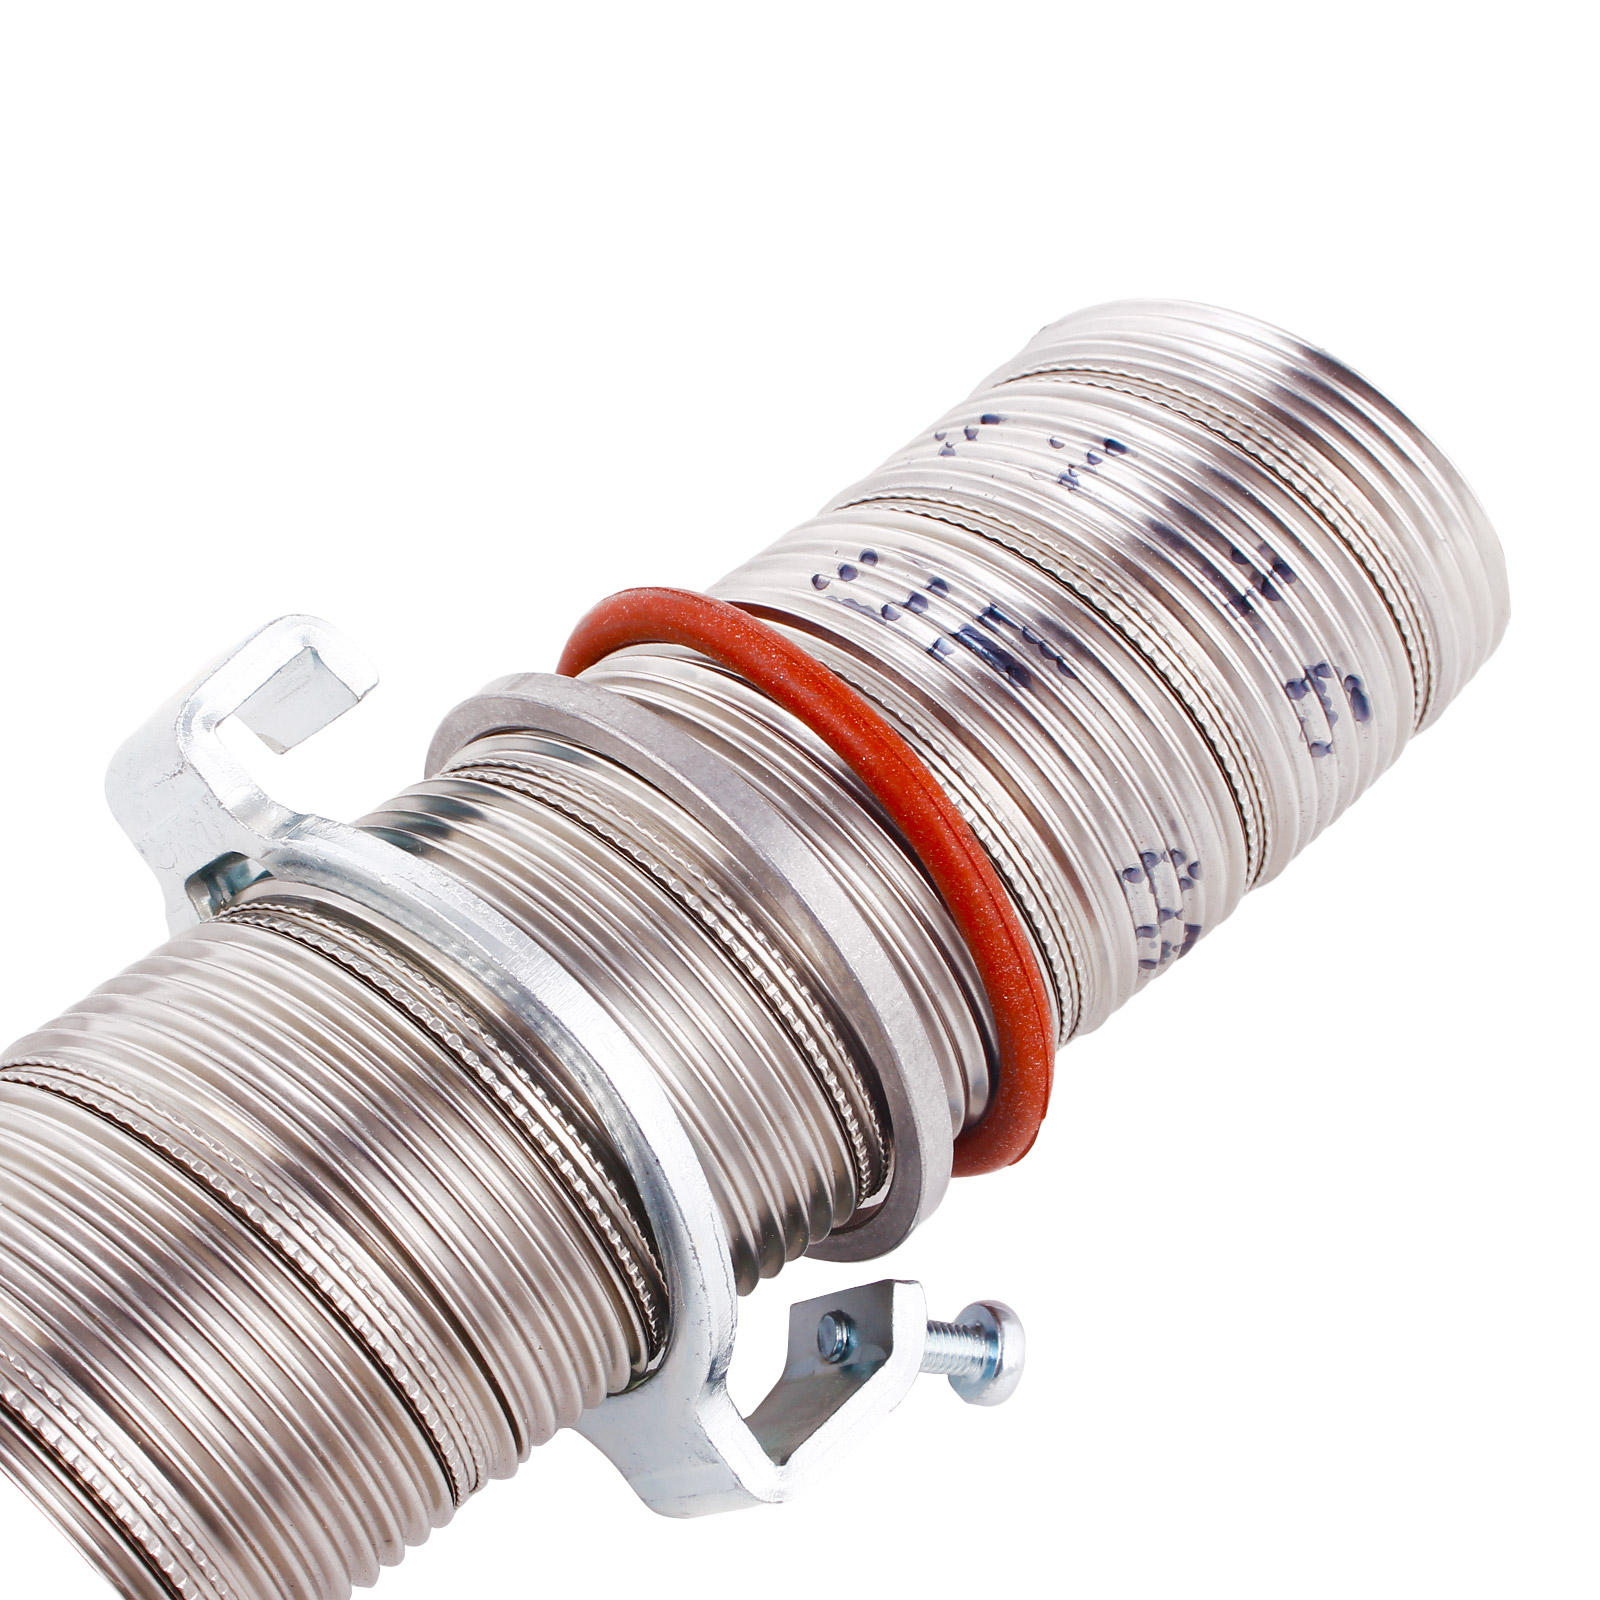 Truma Abgasrohrbefestigung Dichtung passend für Trumatic S 3002, S 3004